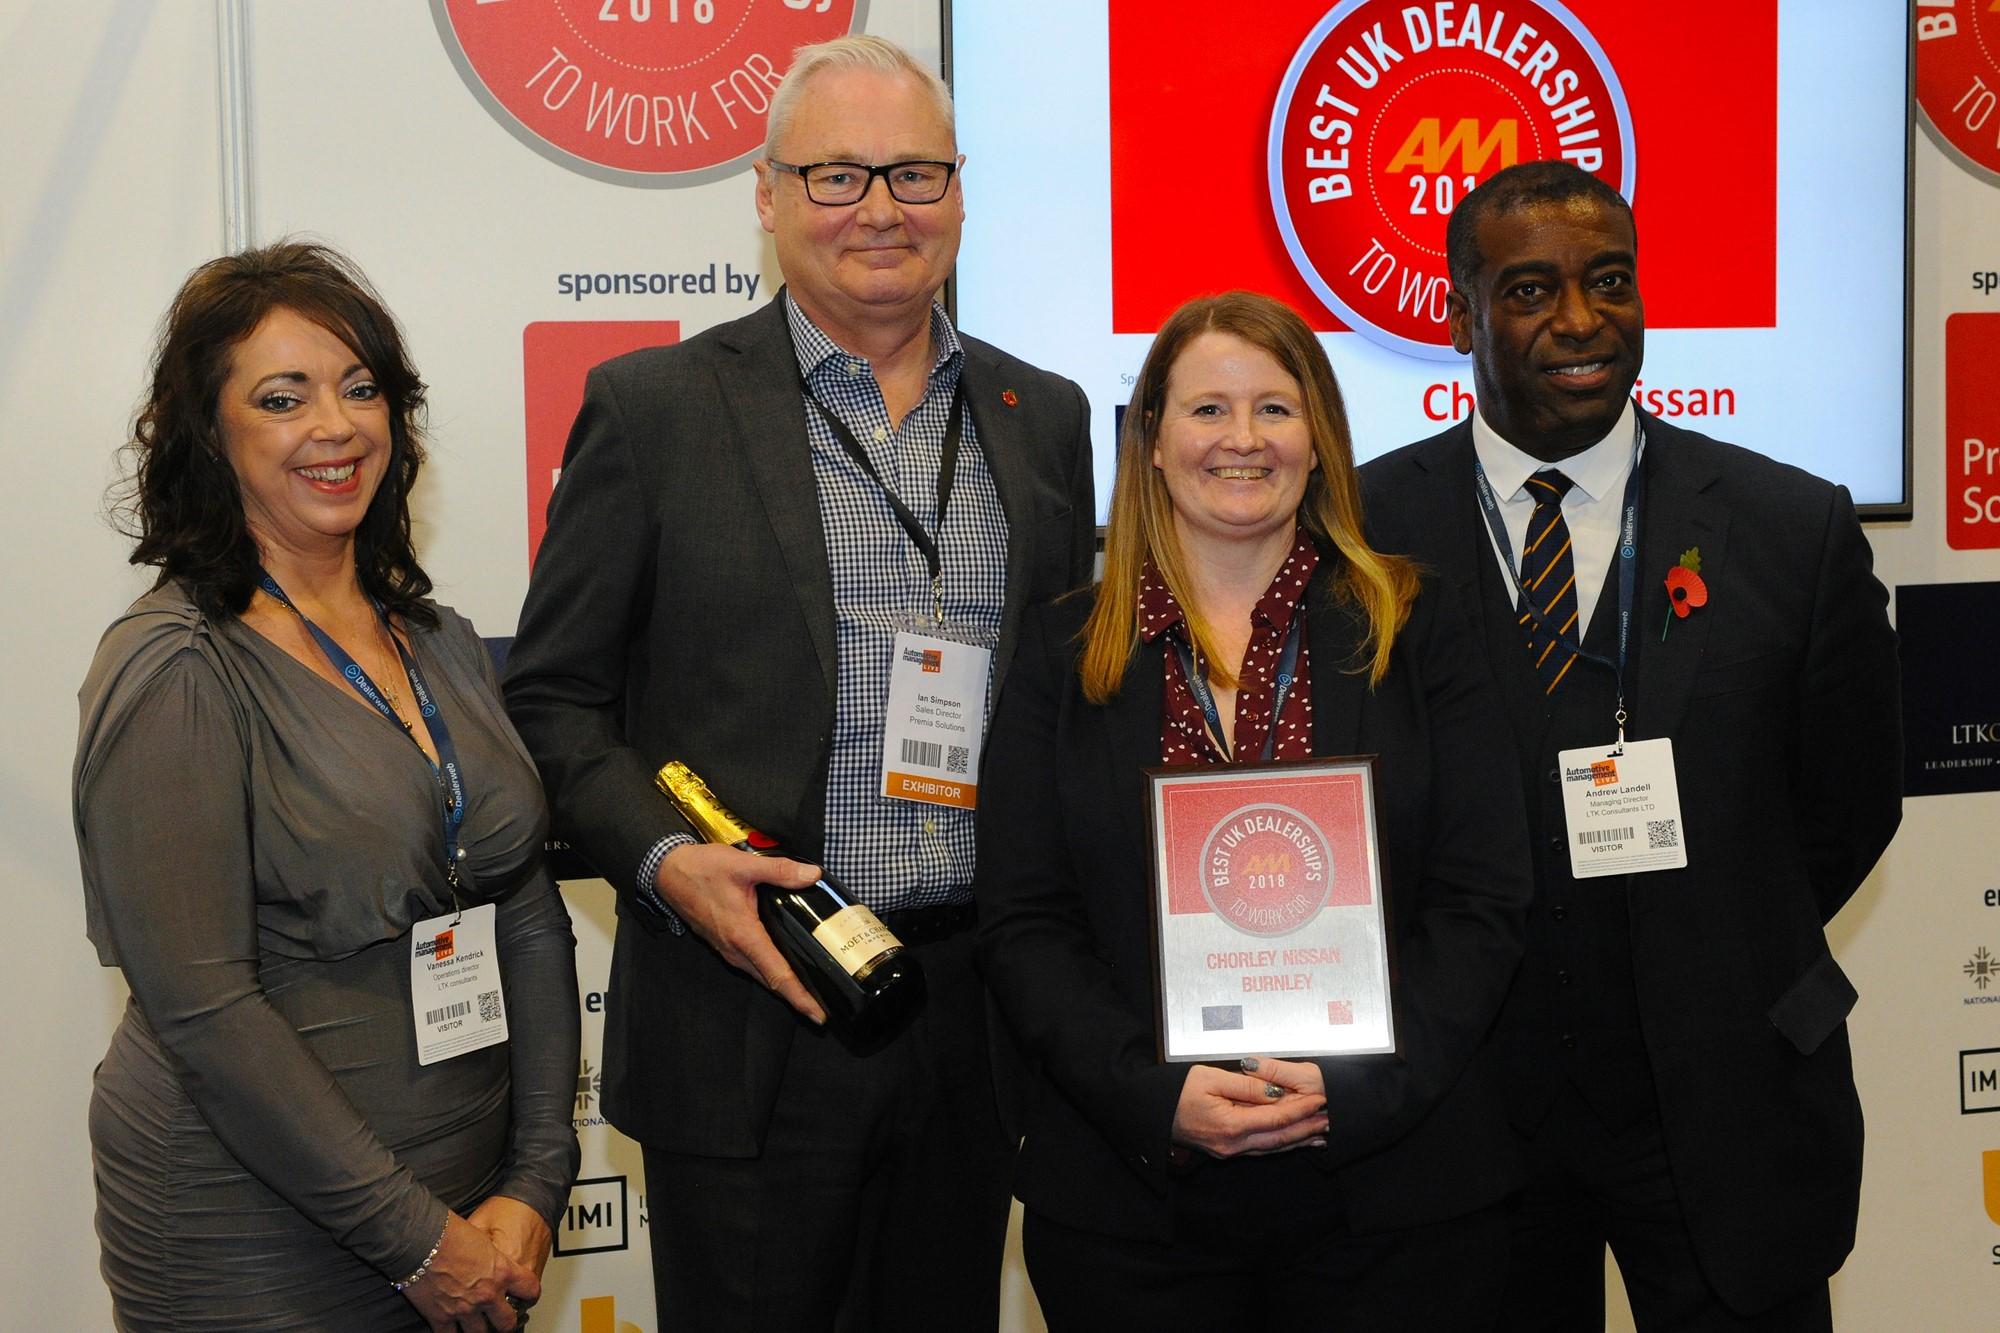 AM Best UK Dealership 2018 Chorley Nissan